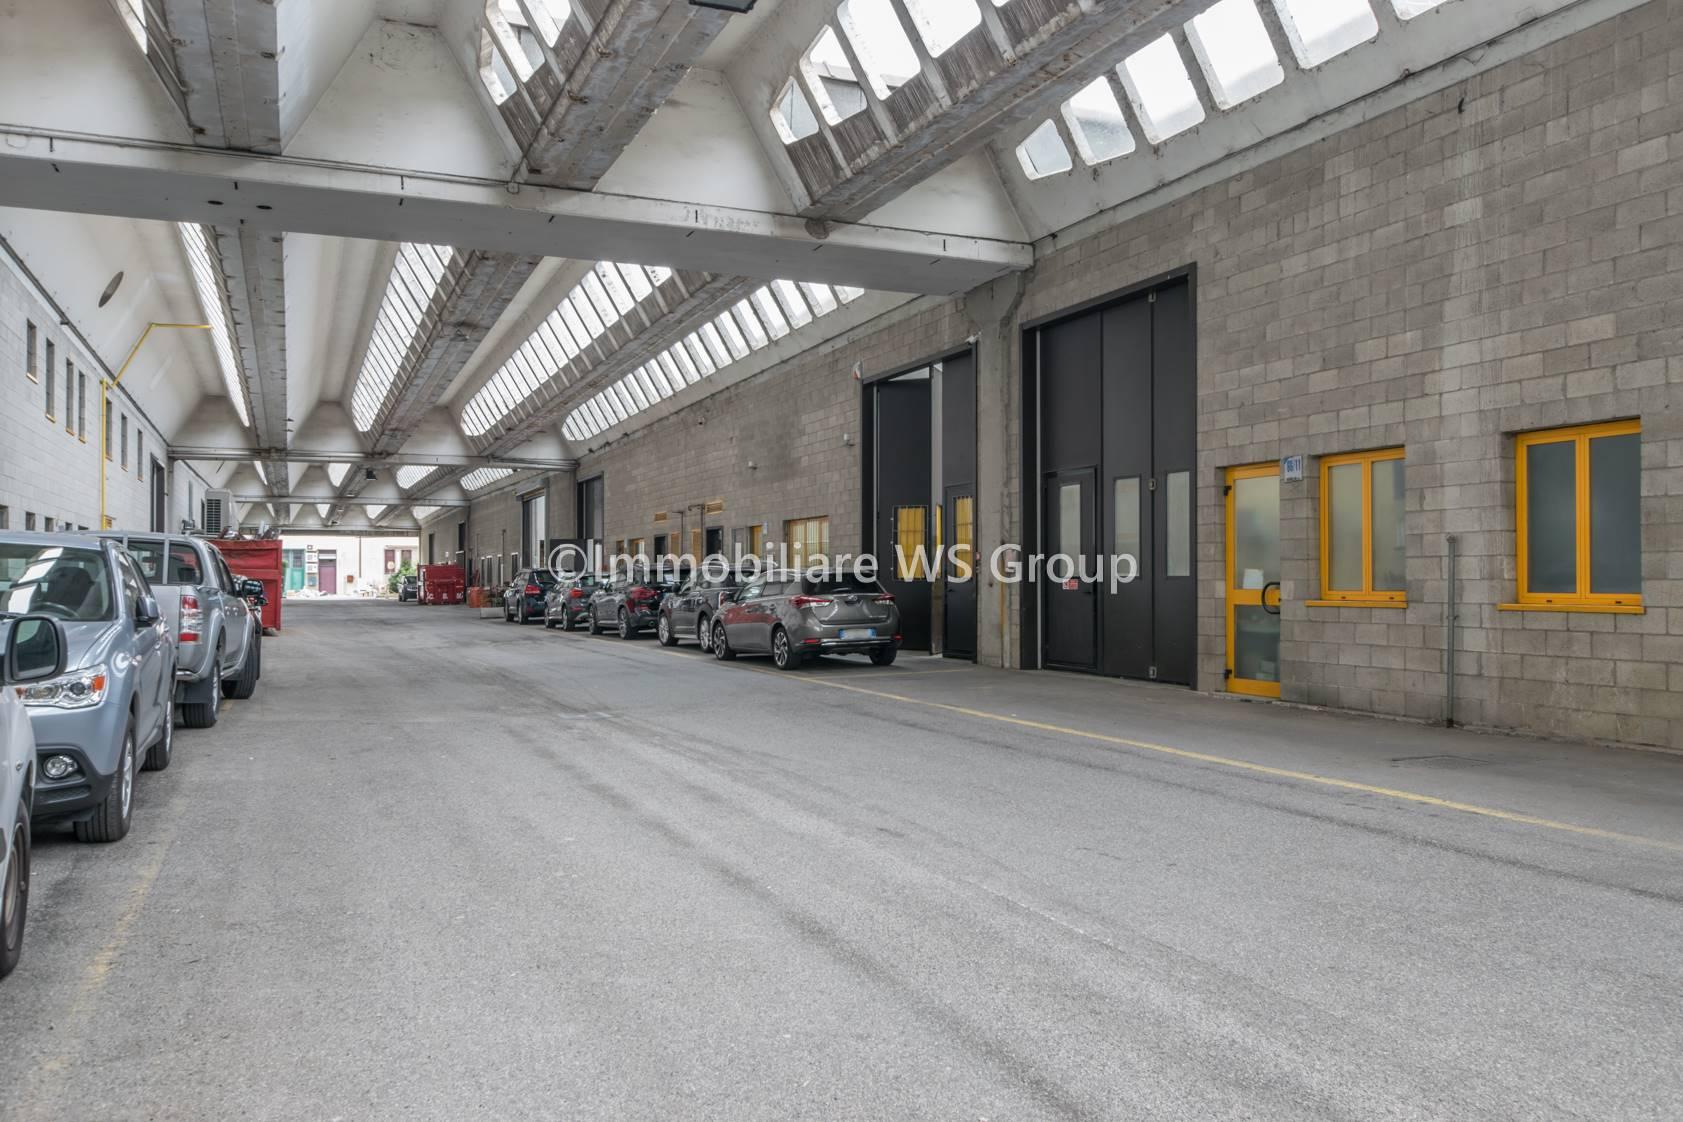 Capannone in Vendita a Monza: 2 locali, 200 mq